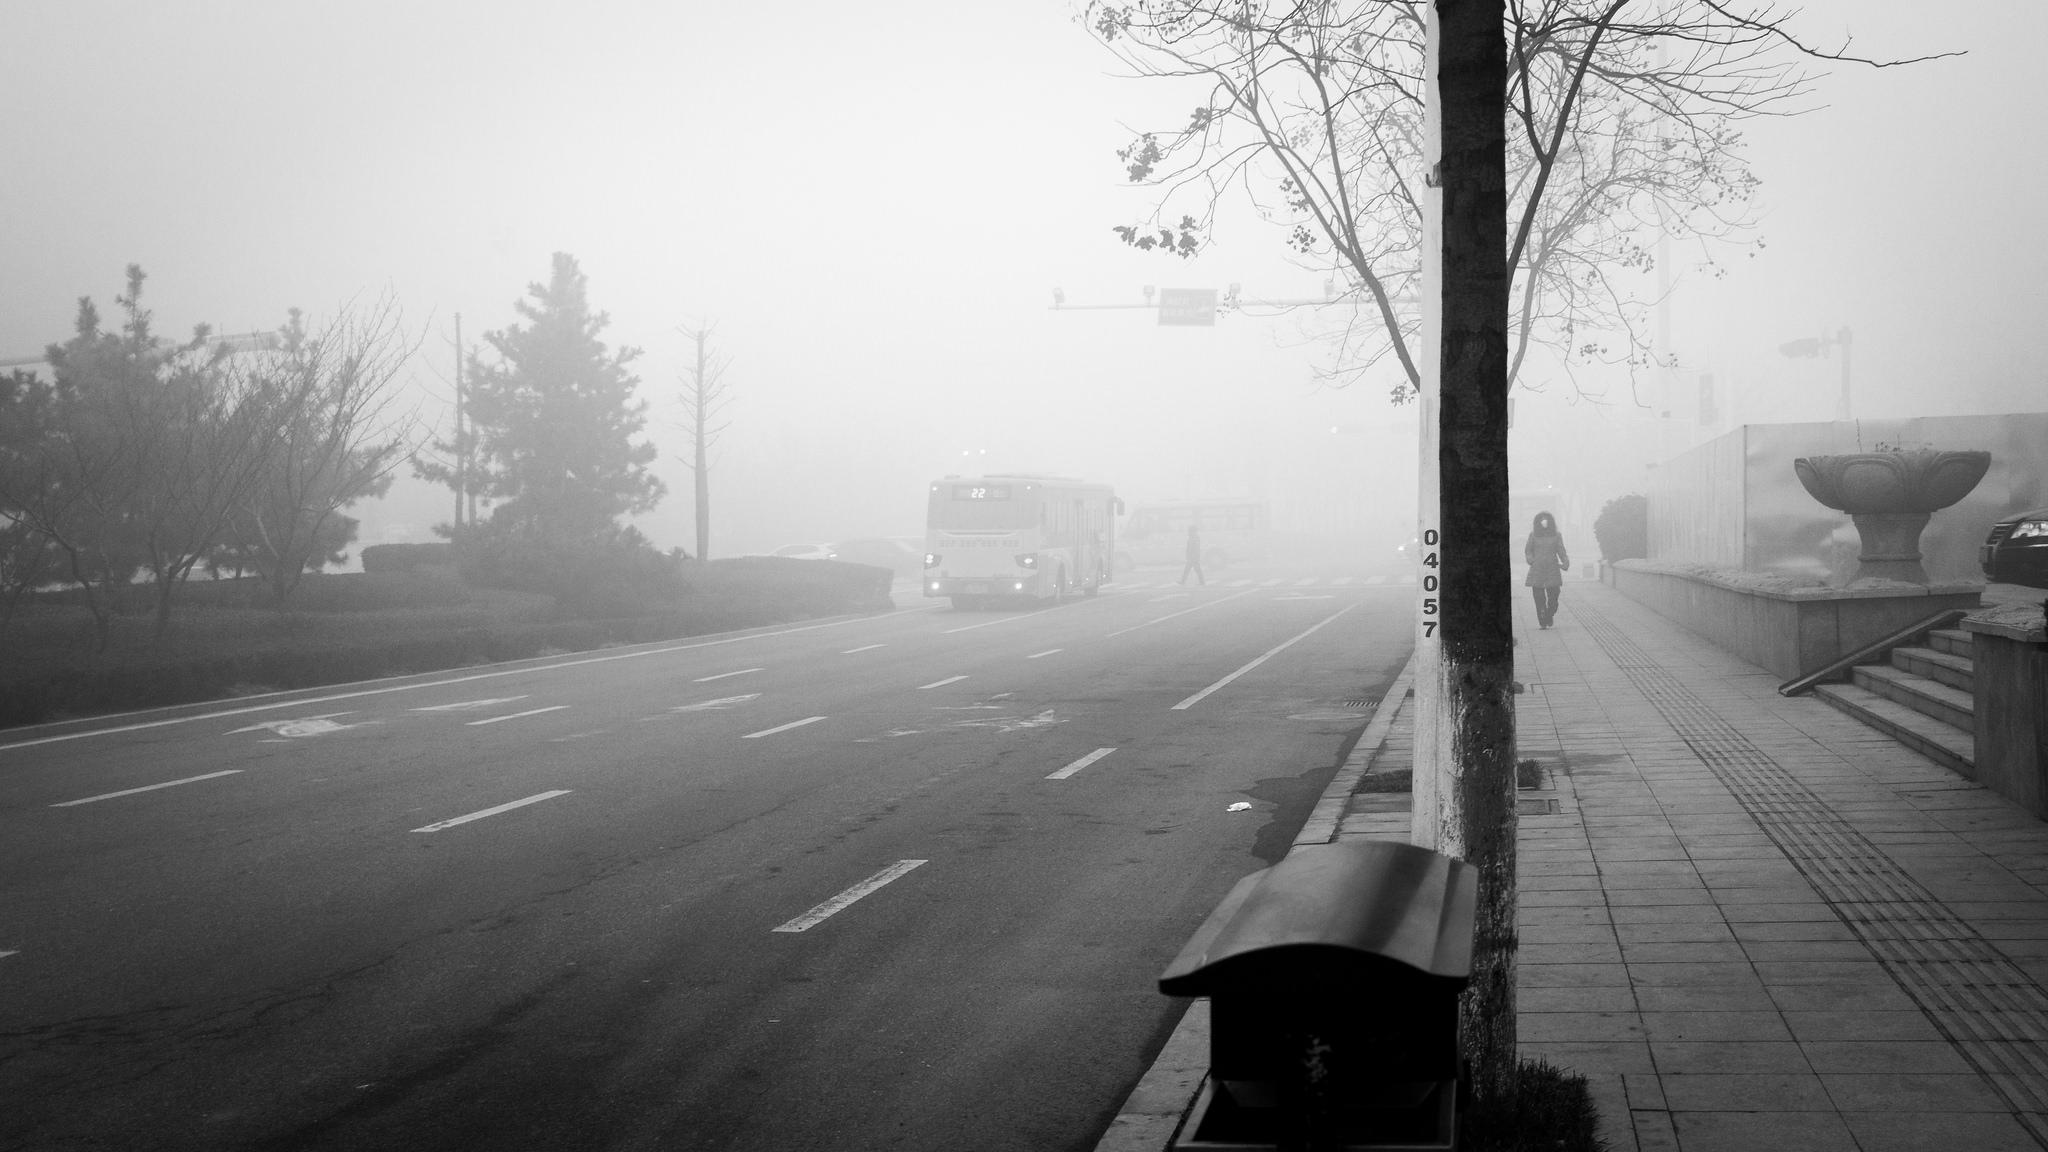 (Photo Flickr/Gauthier DELECROIX - 郭天)